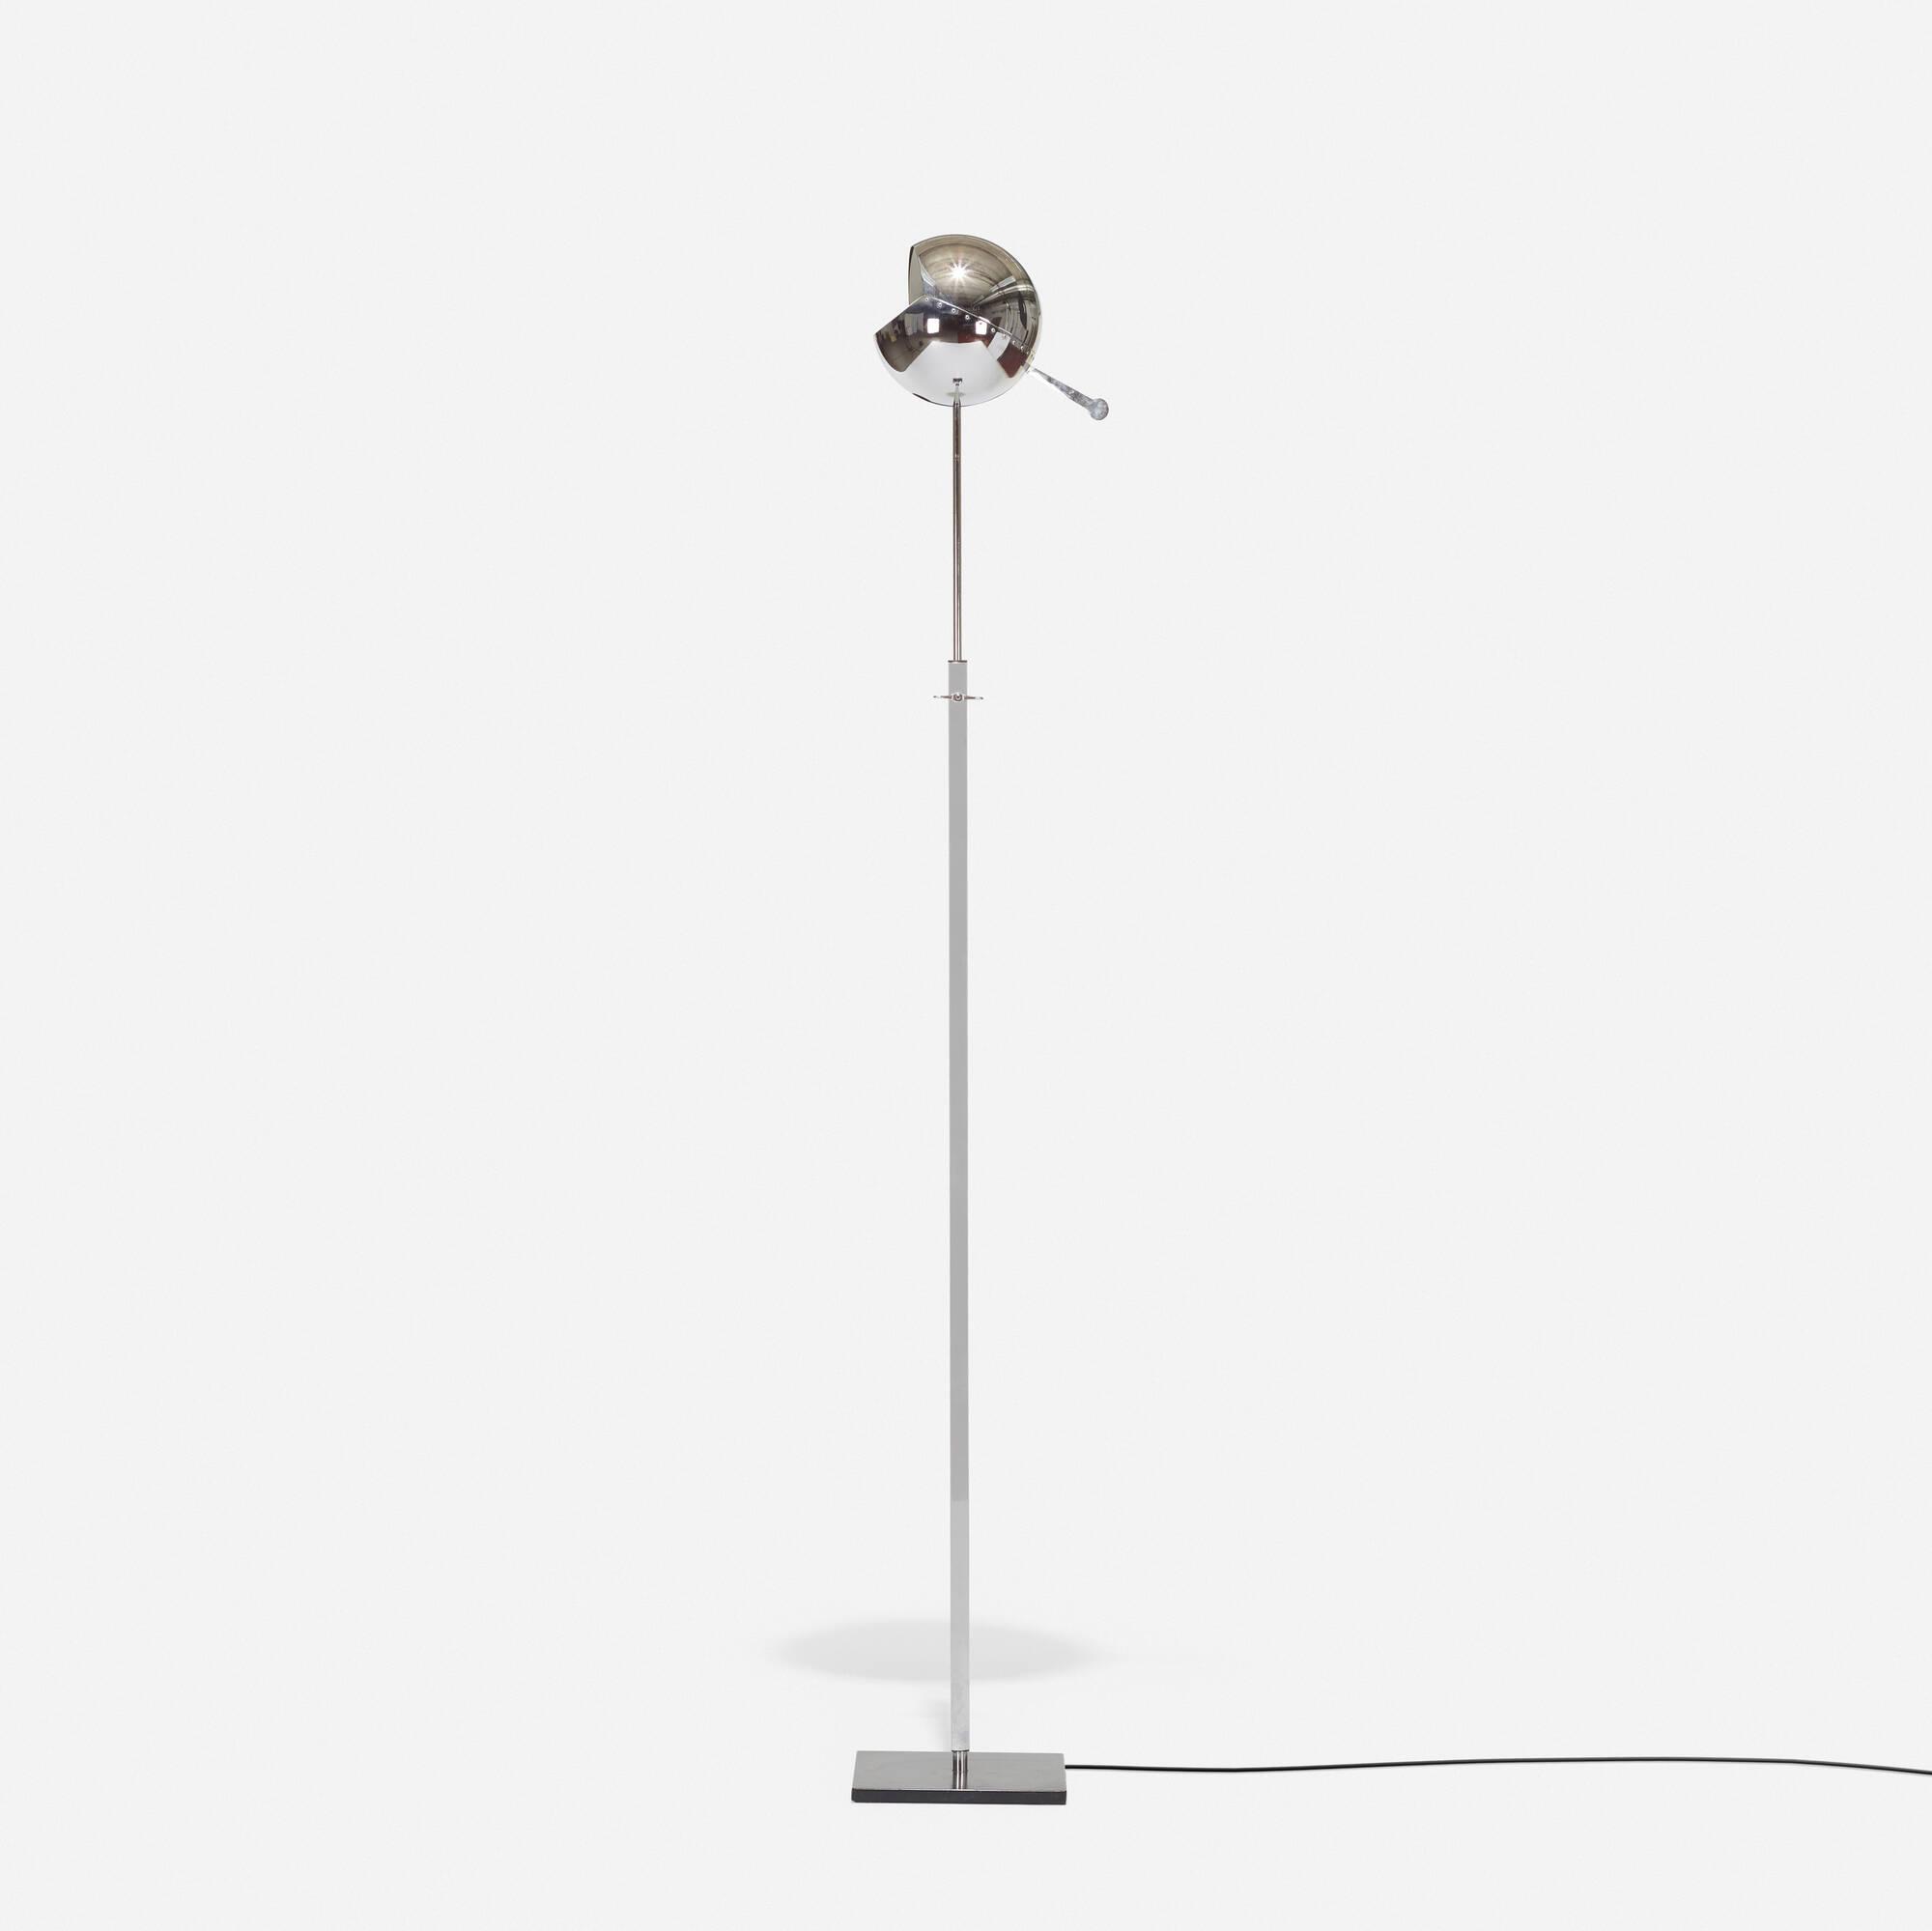 306: Carlo Forcolini / Fireball floor lamp (1 of 2)